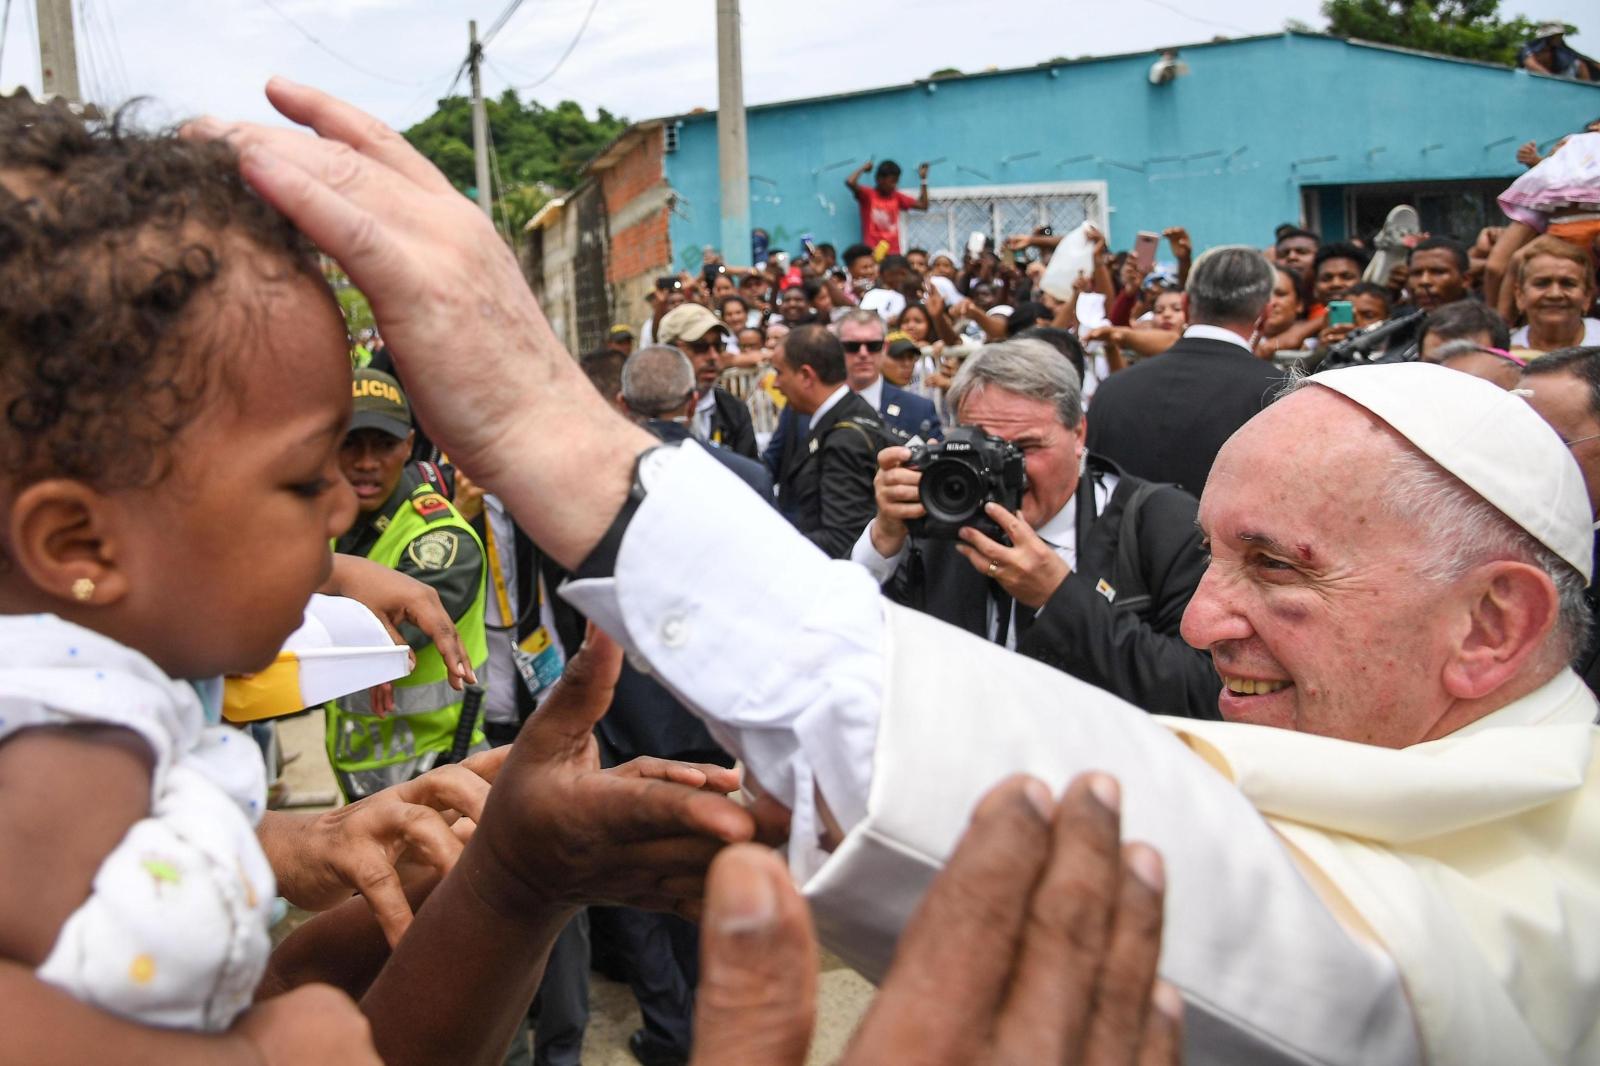 Papież Franciszek w Kolumbii EPA/ALESSANDRO DI MEO